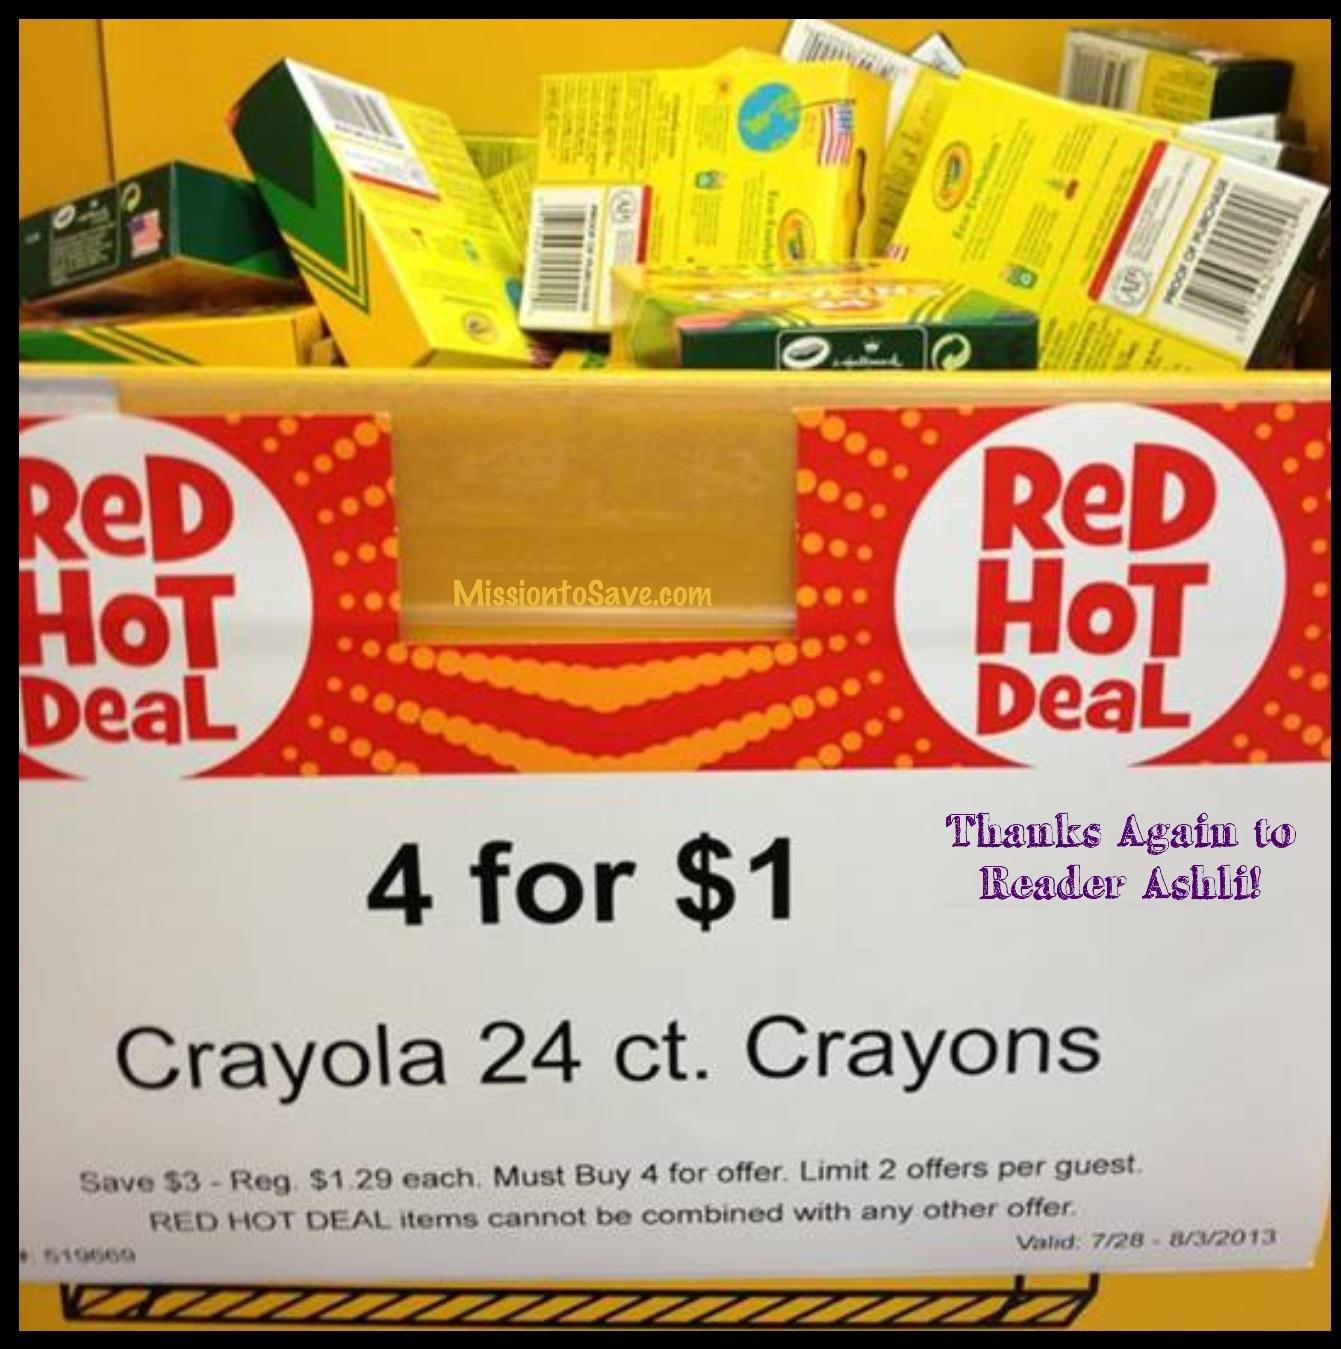 It's Back! Unadvertised ToysRUs Crayola Sale- 4 for $1!